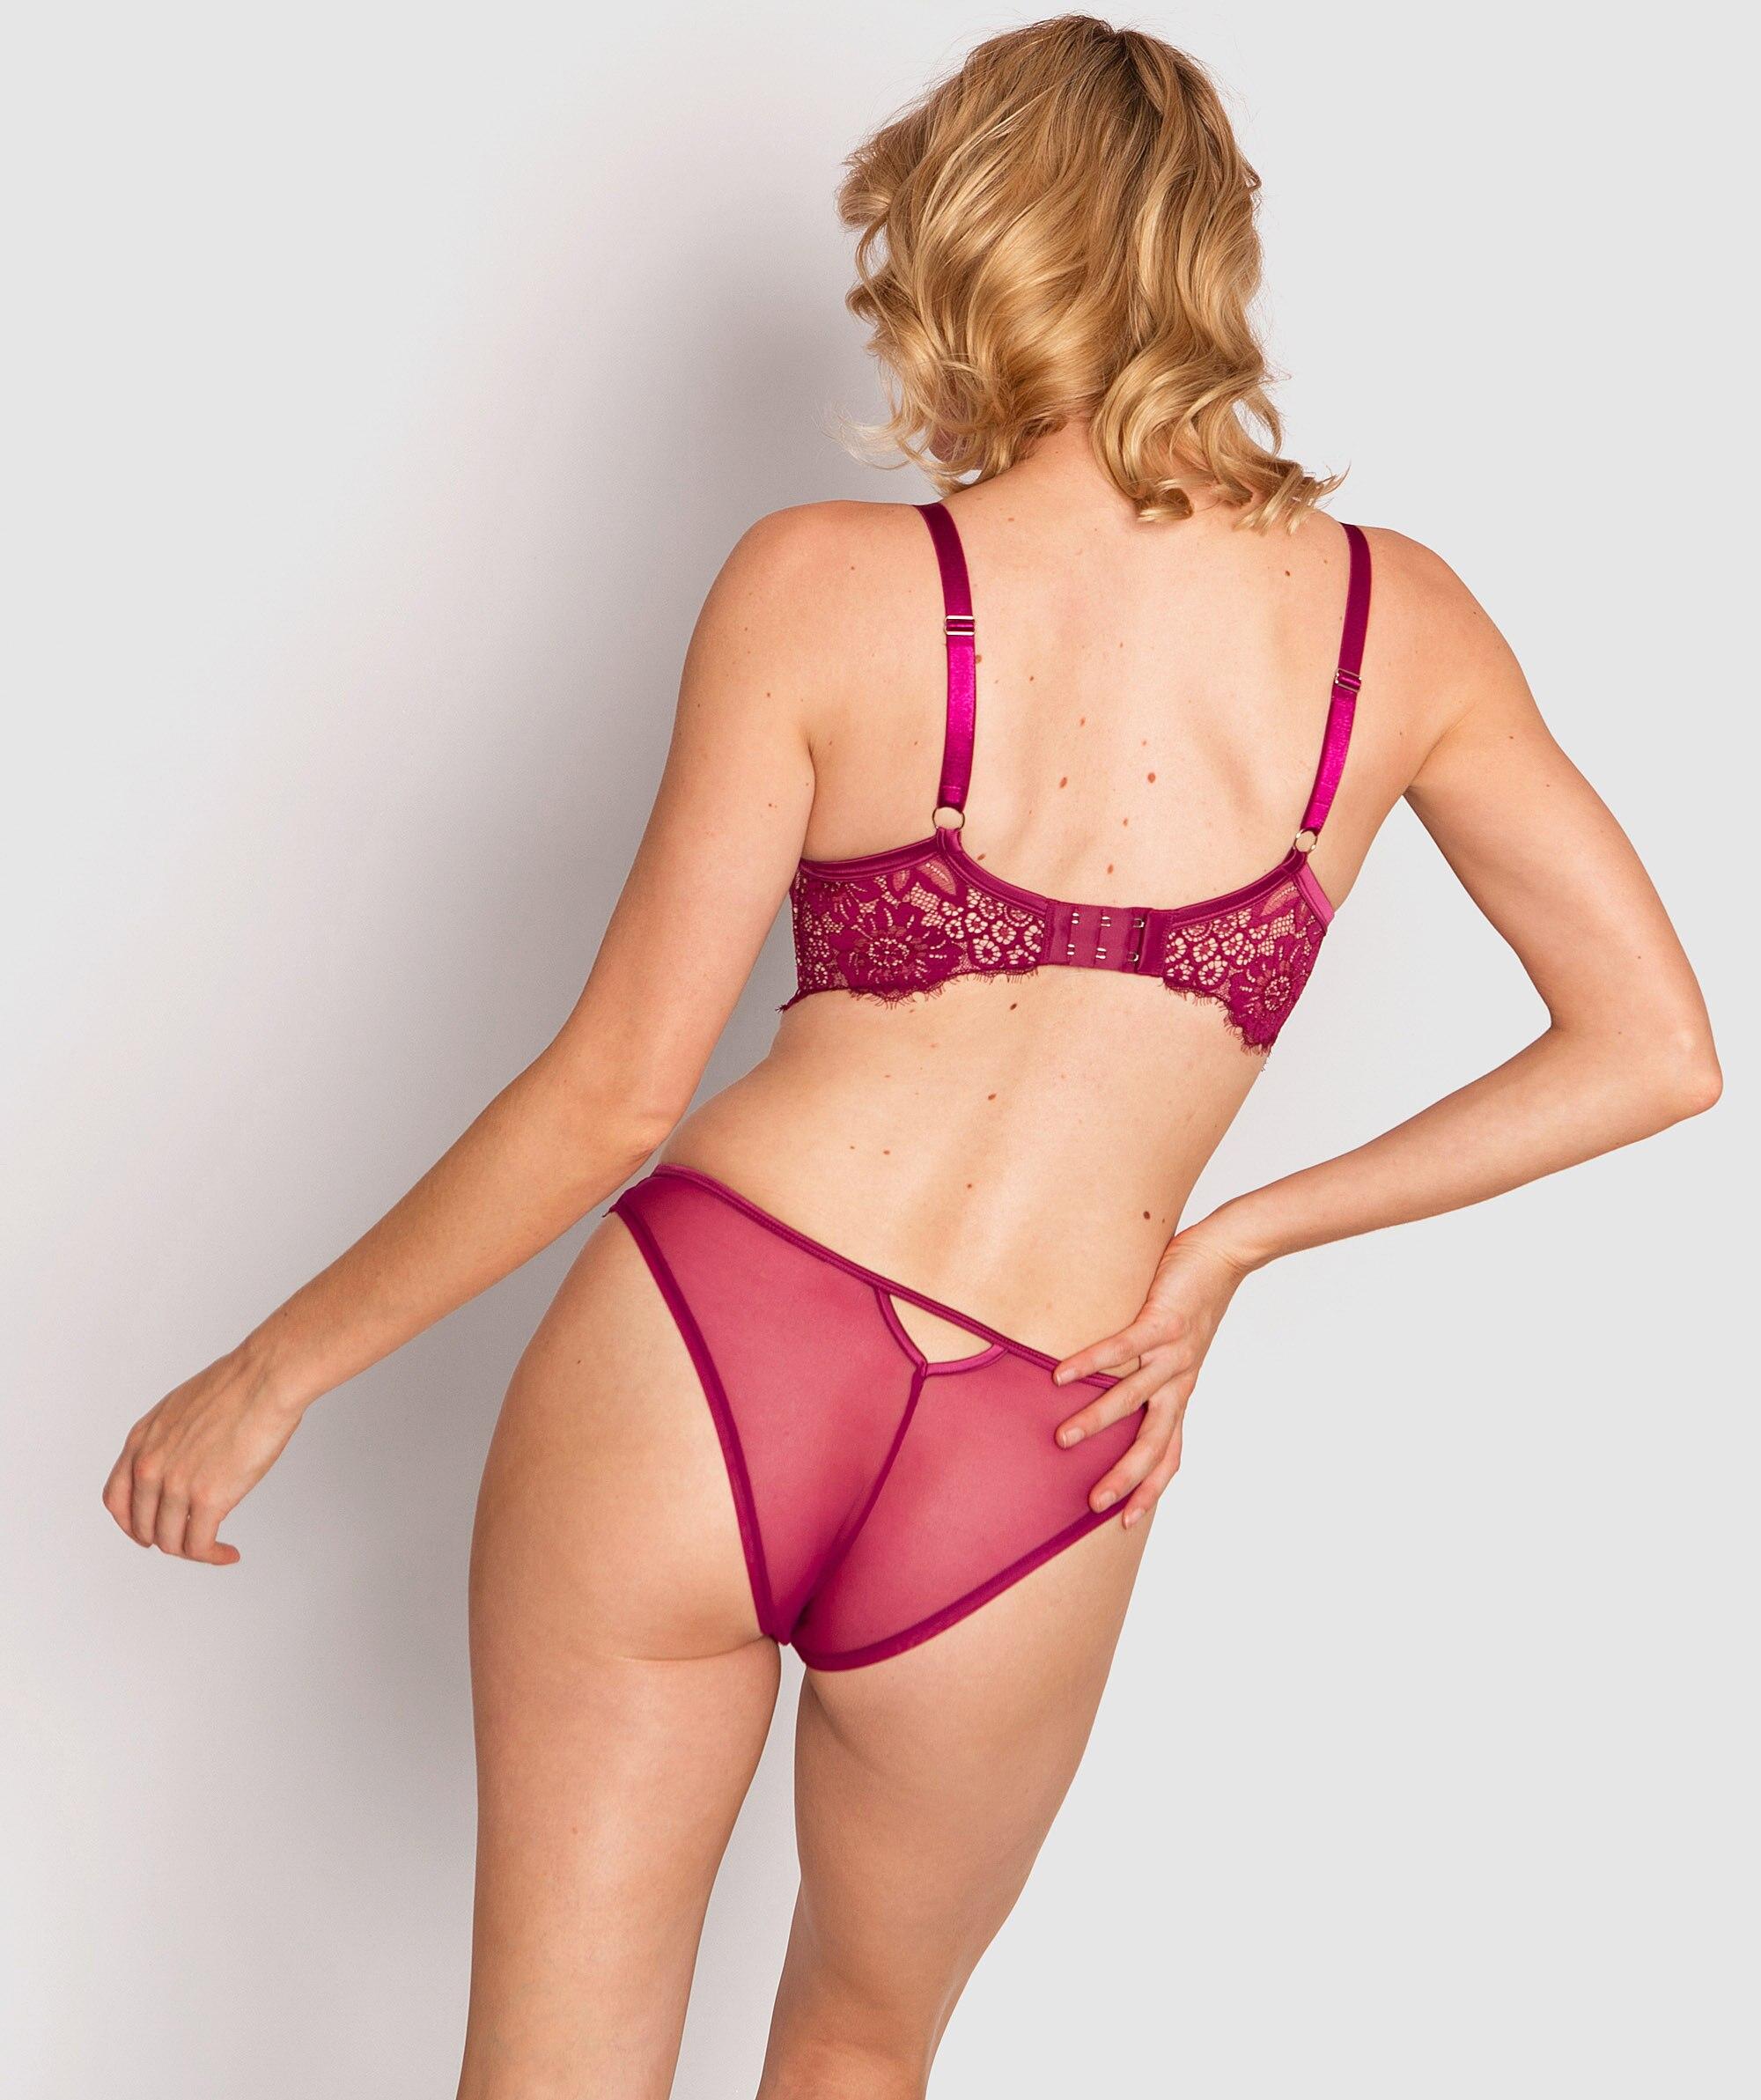 Indulge Me High Waist V String Knicker - Pink/Nude